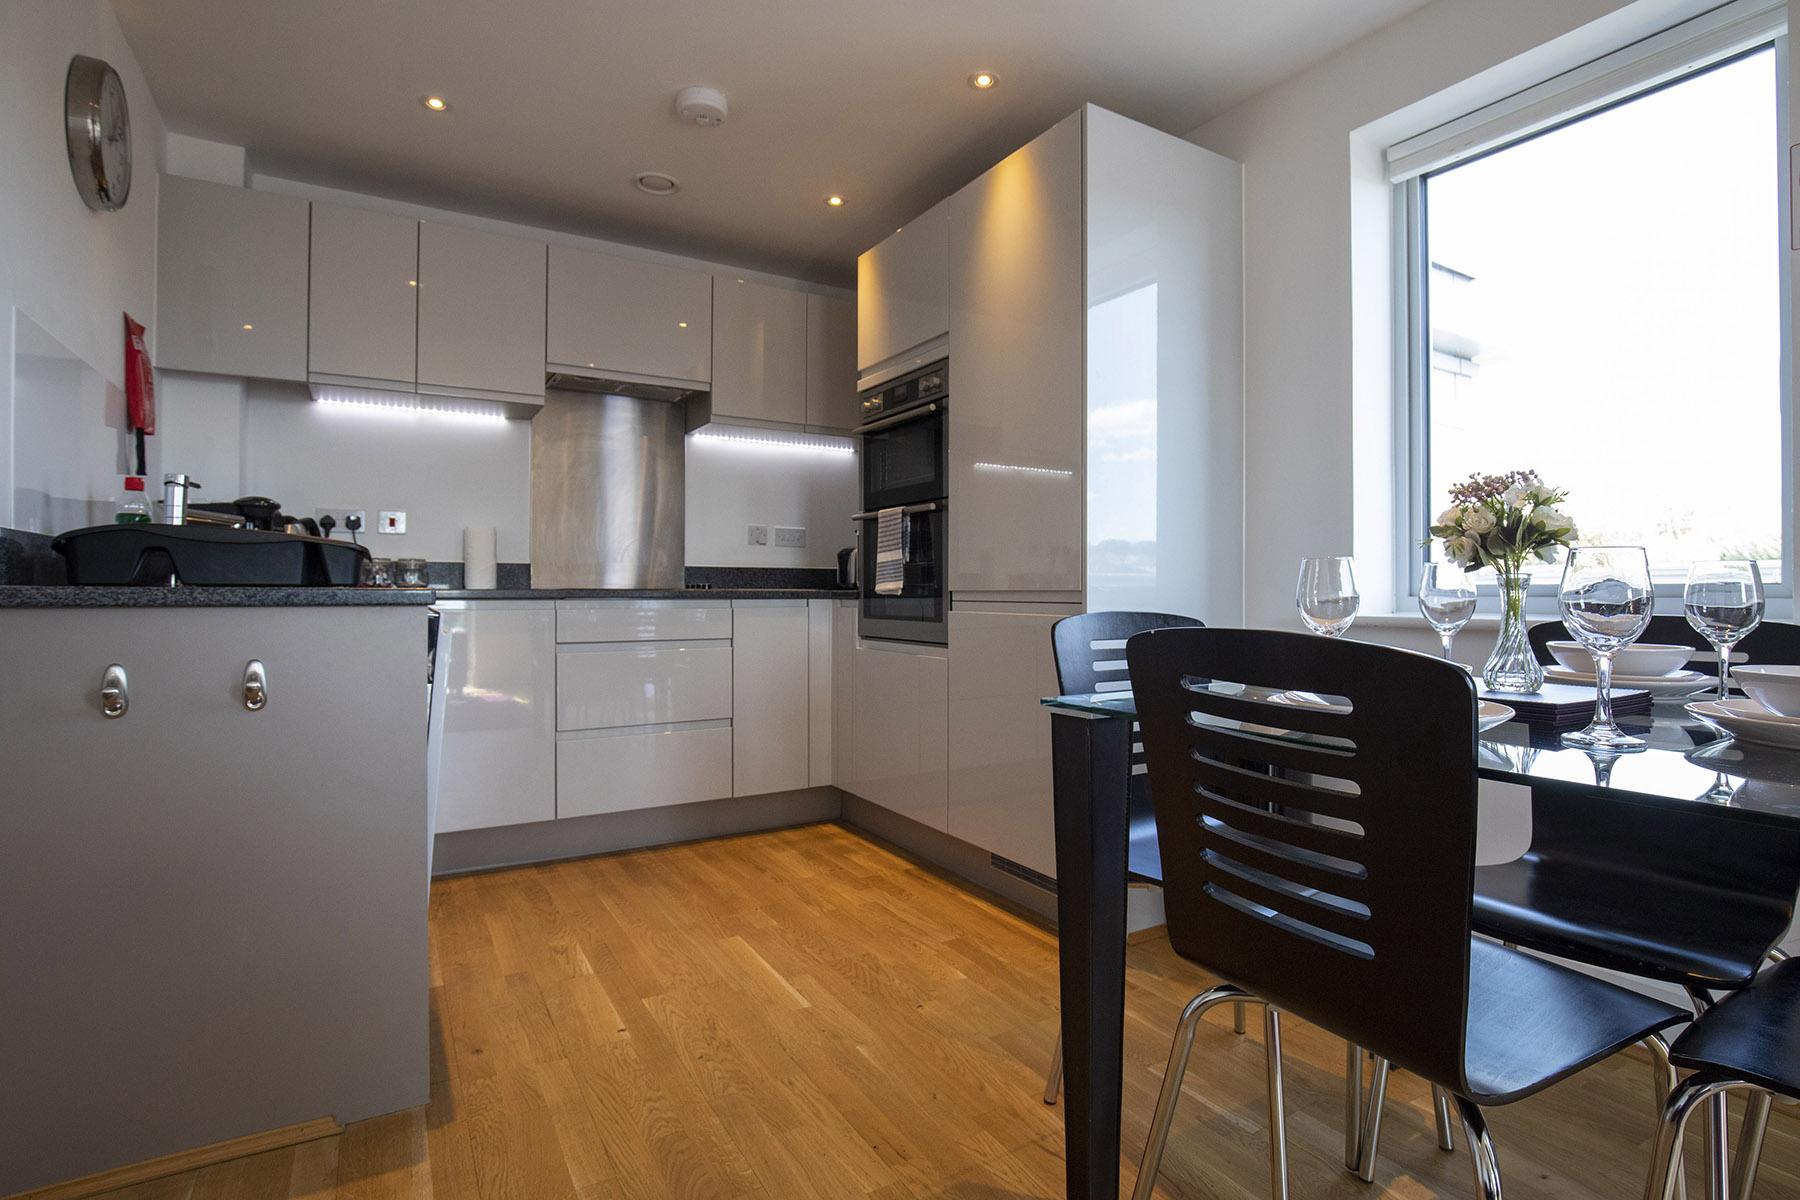 Kitchen at Station View Apartments - Citybase Apartments